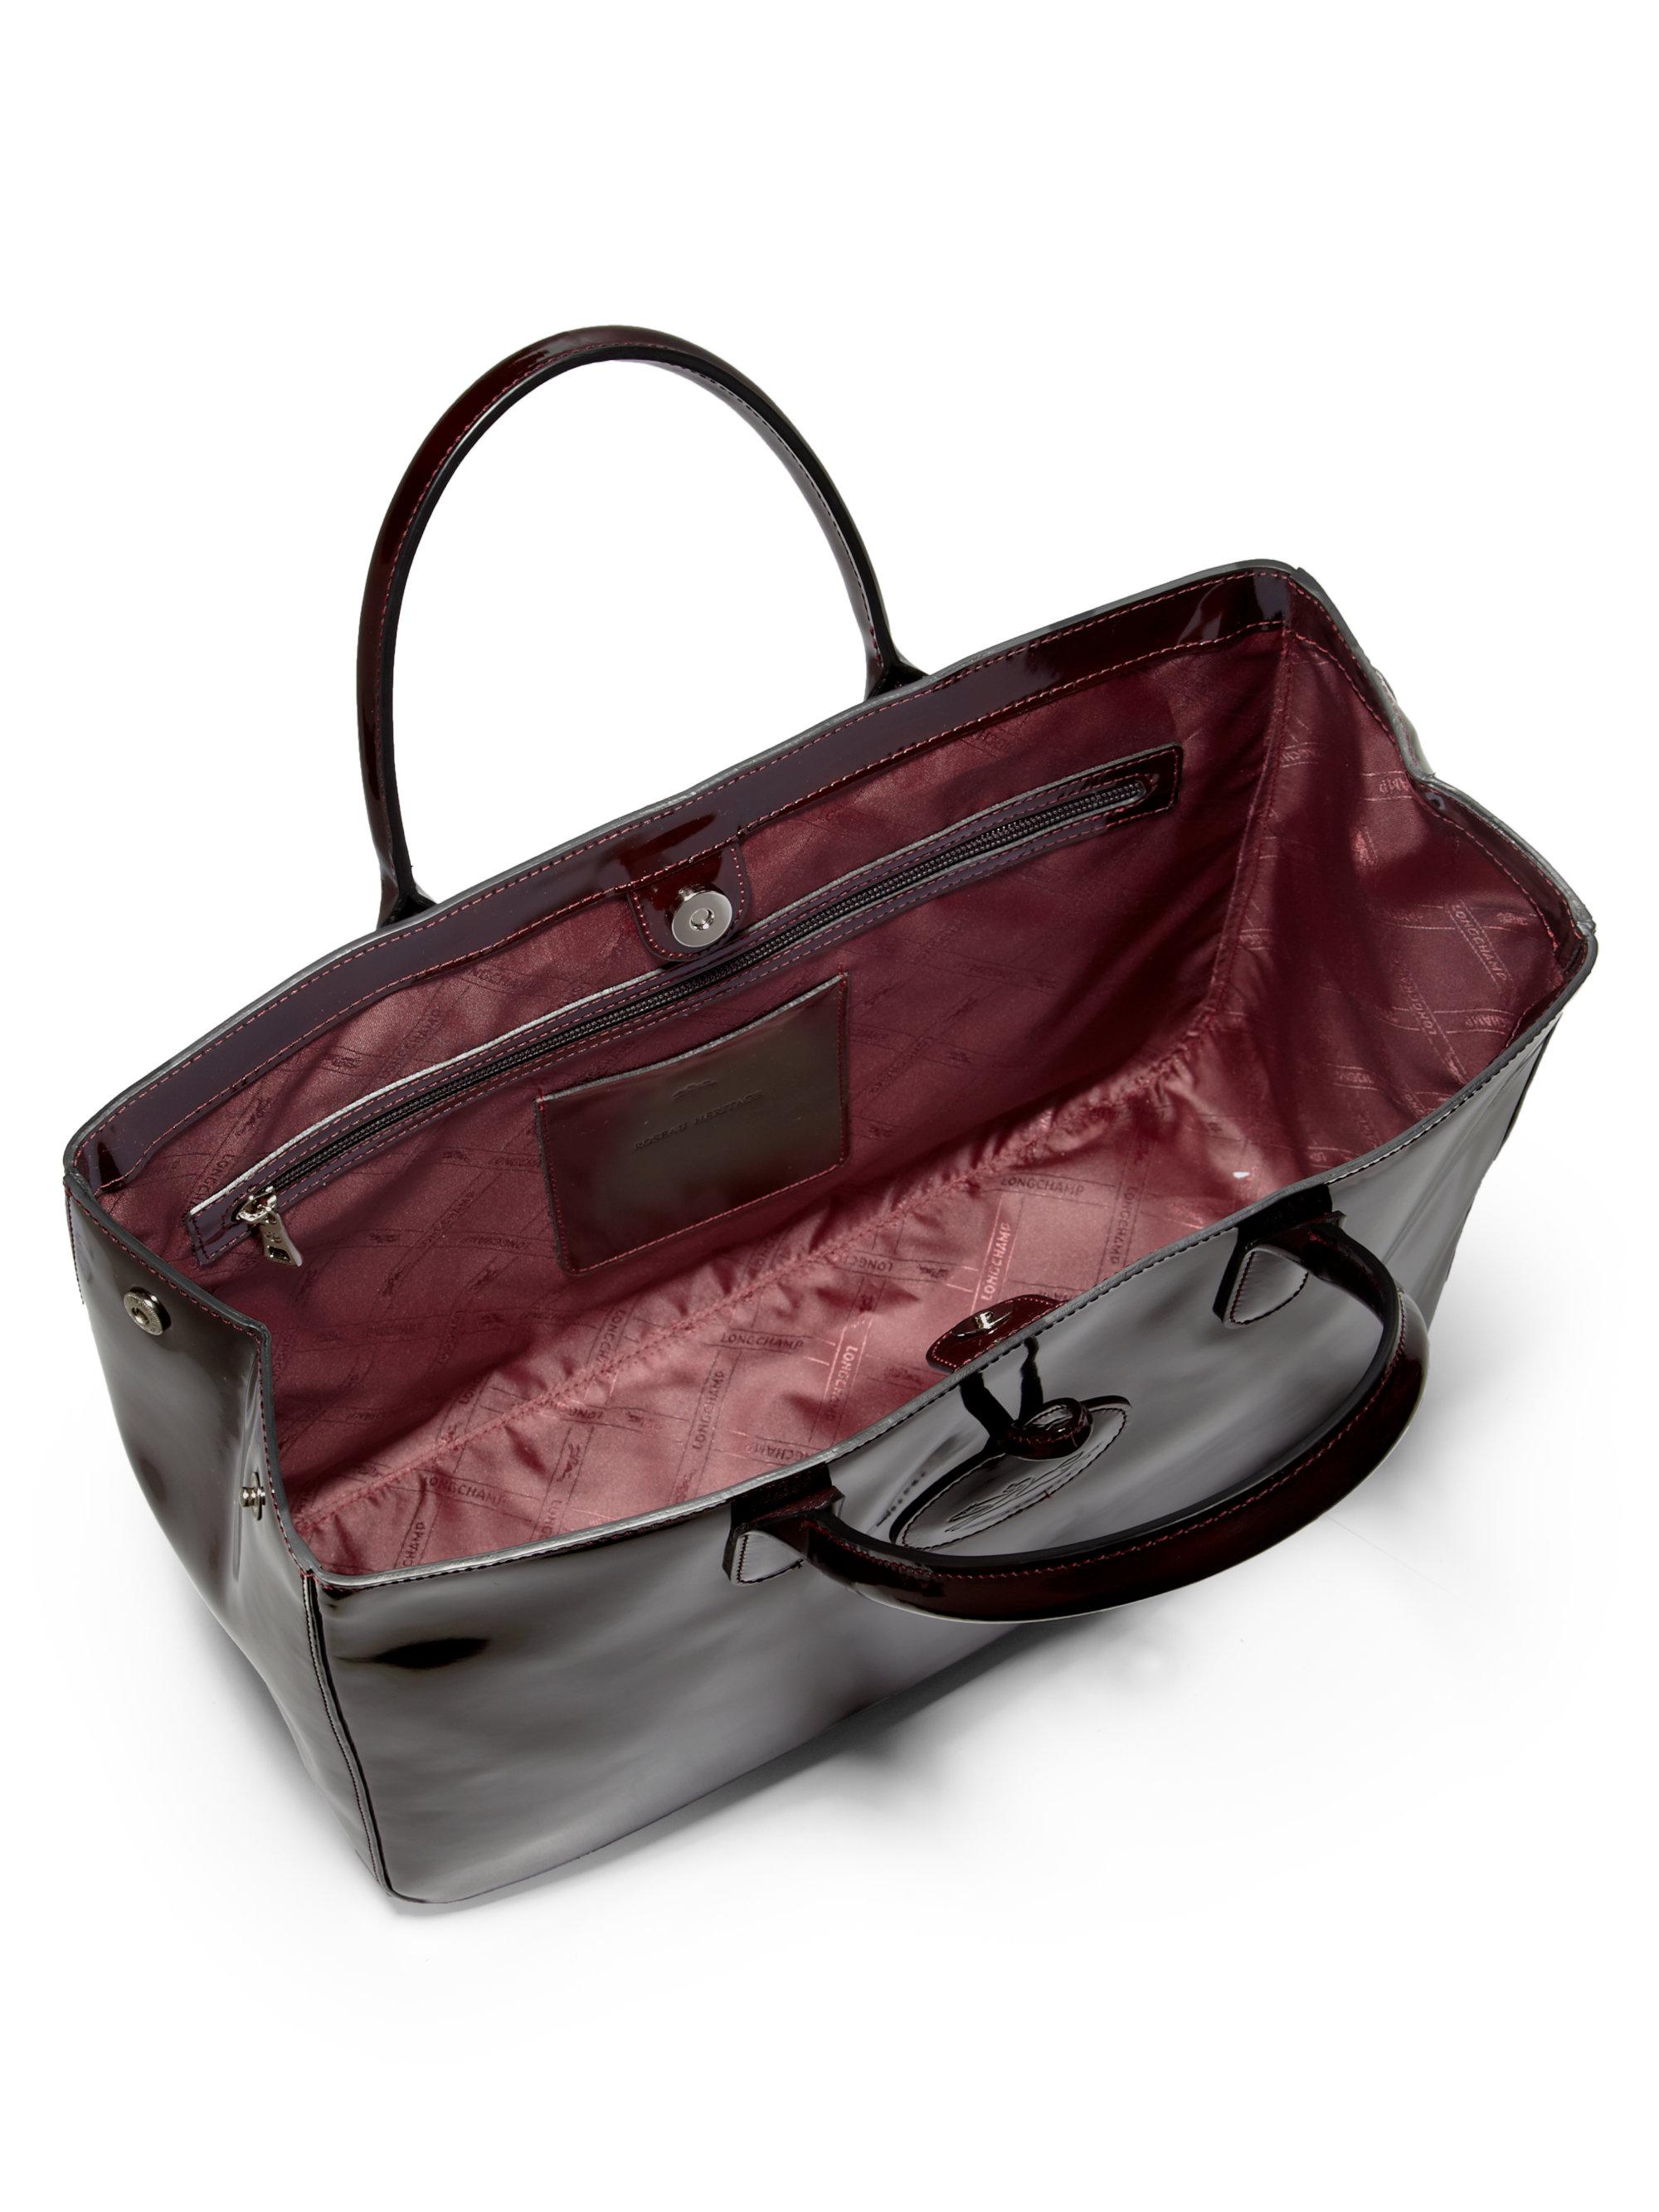 Longchamp roseau laukut : Longchamp roseau heritage large box tote in brown lyst